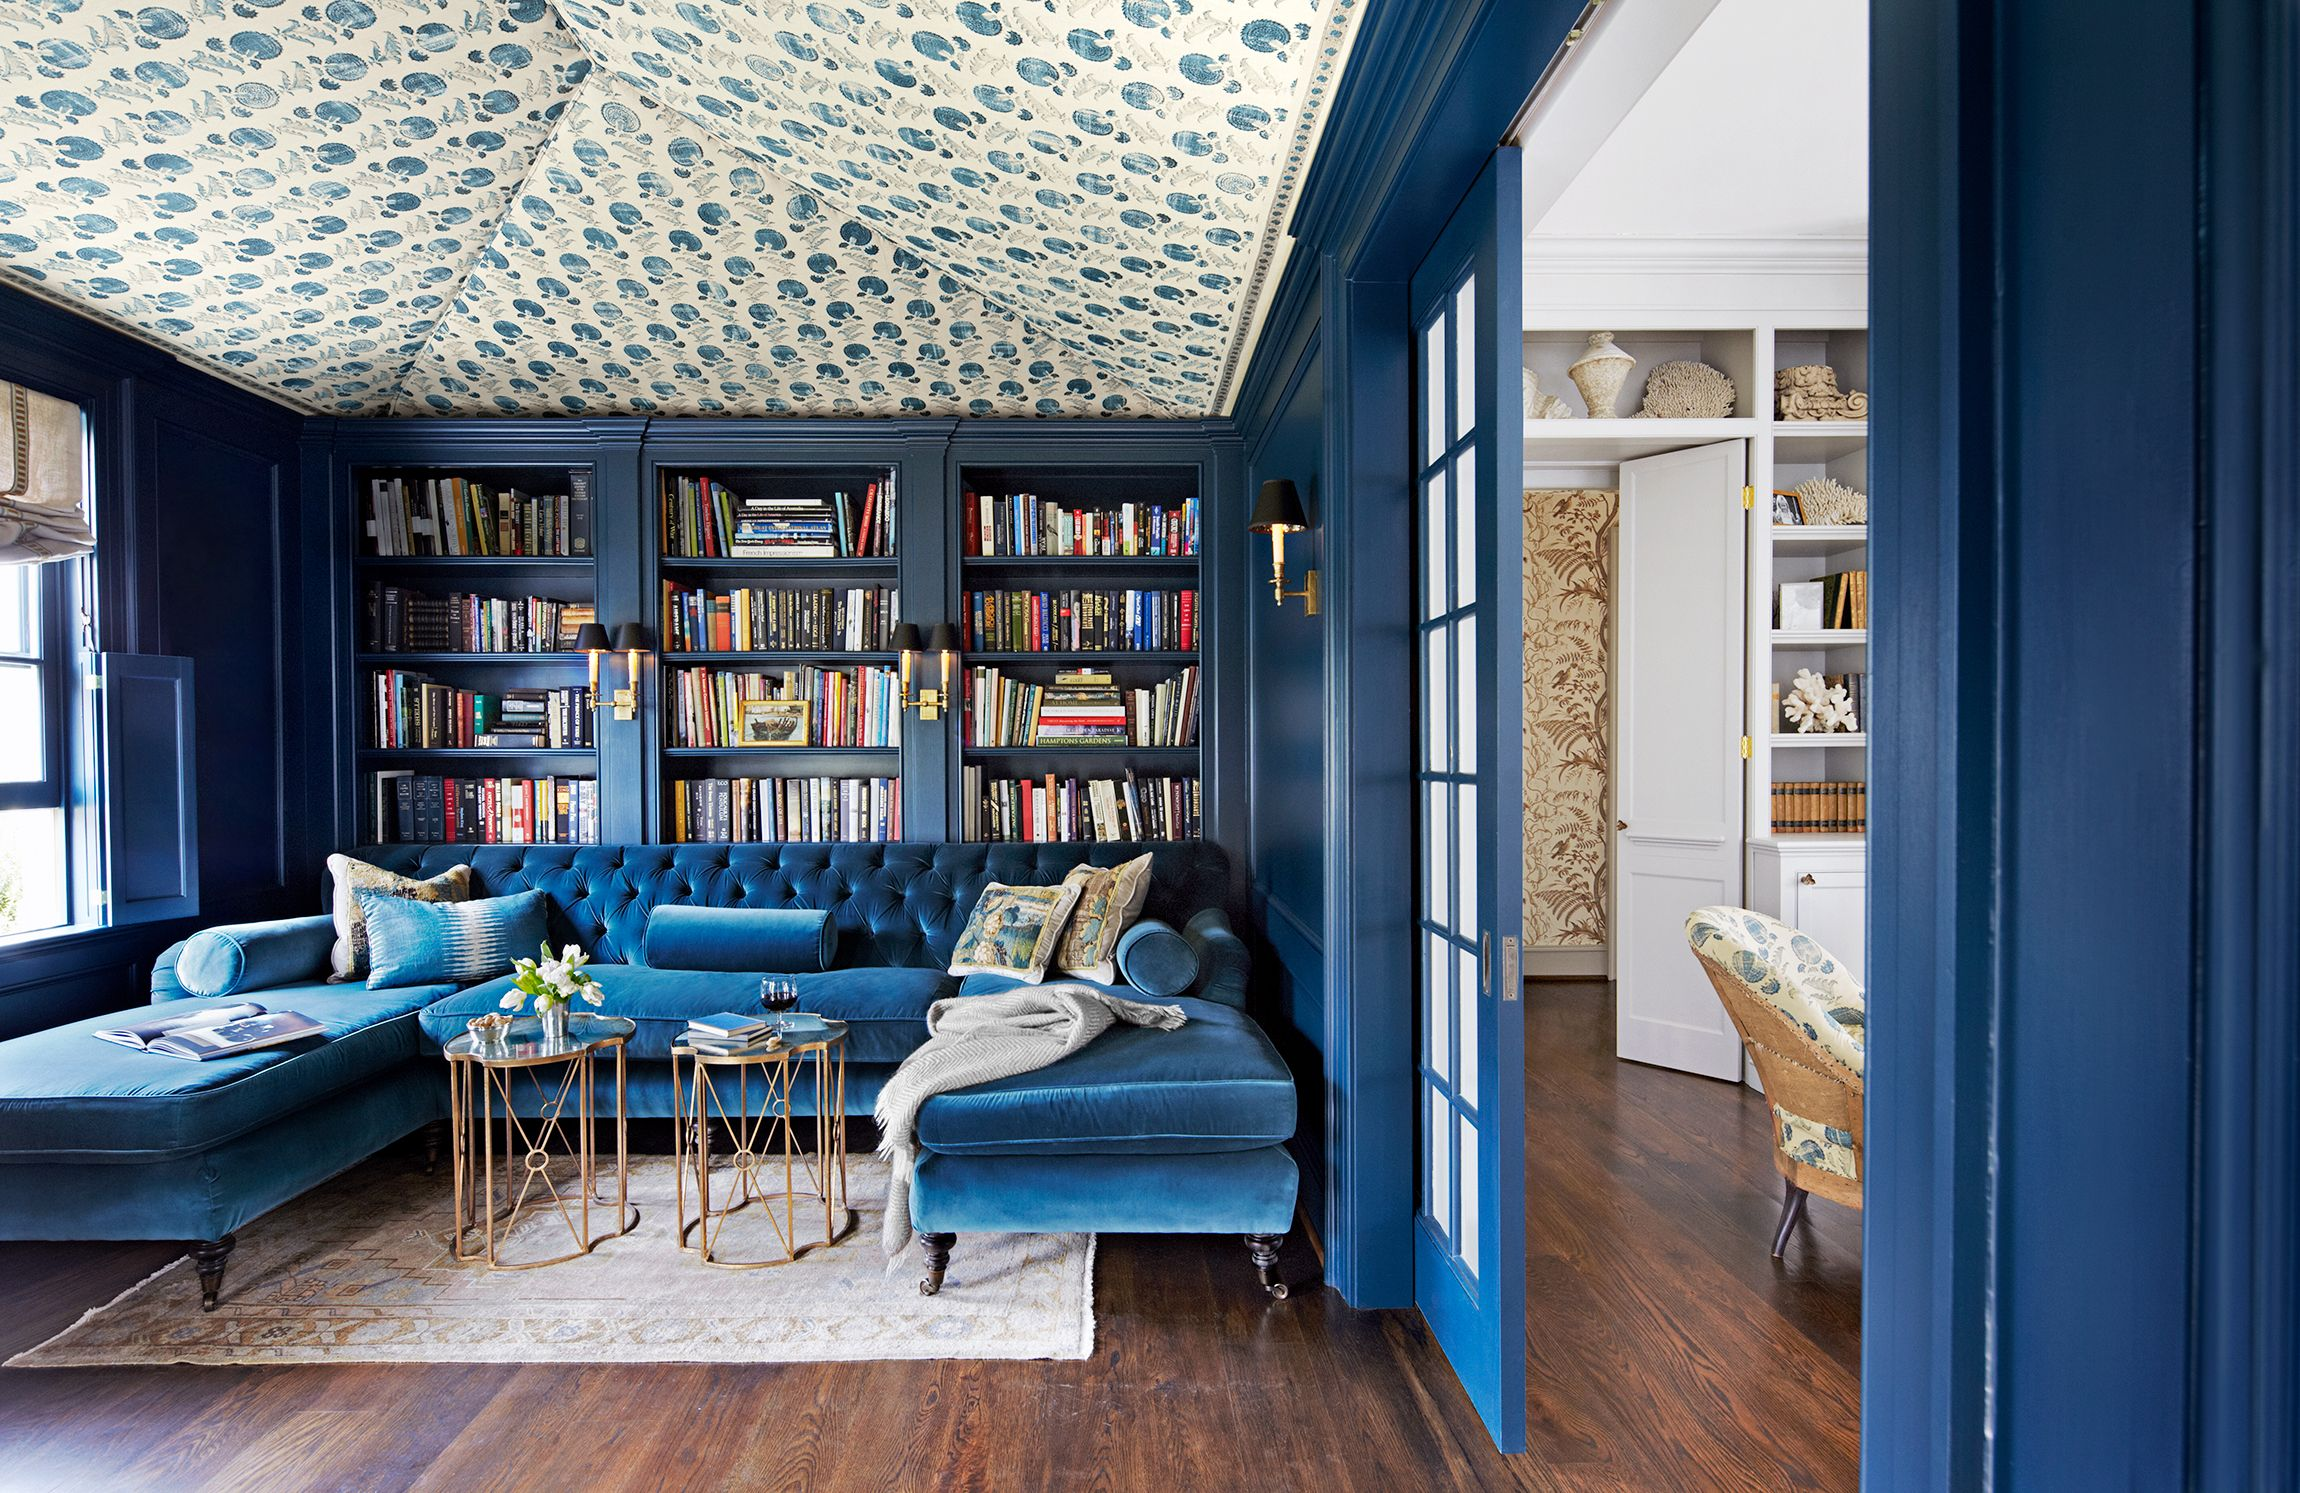 35 Stylish Family Room Design Ideas, Formal Living Room Ideas